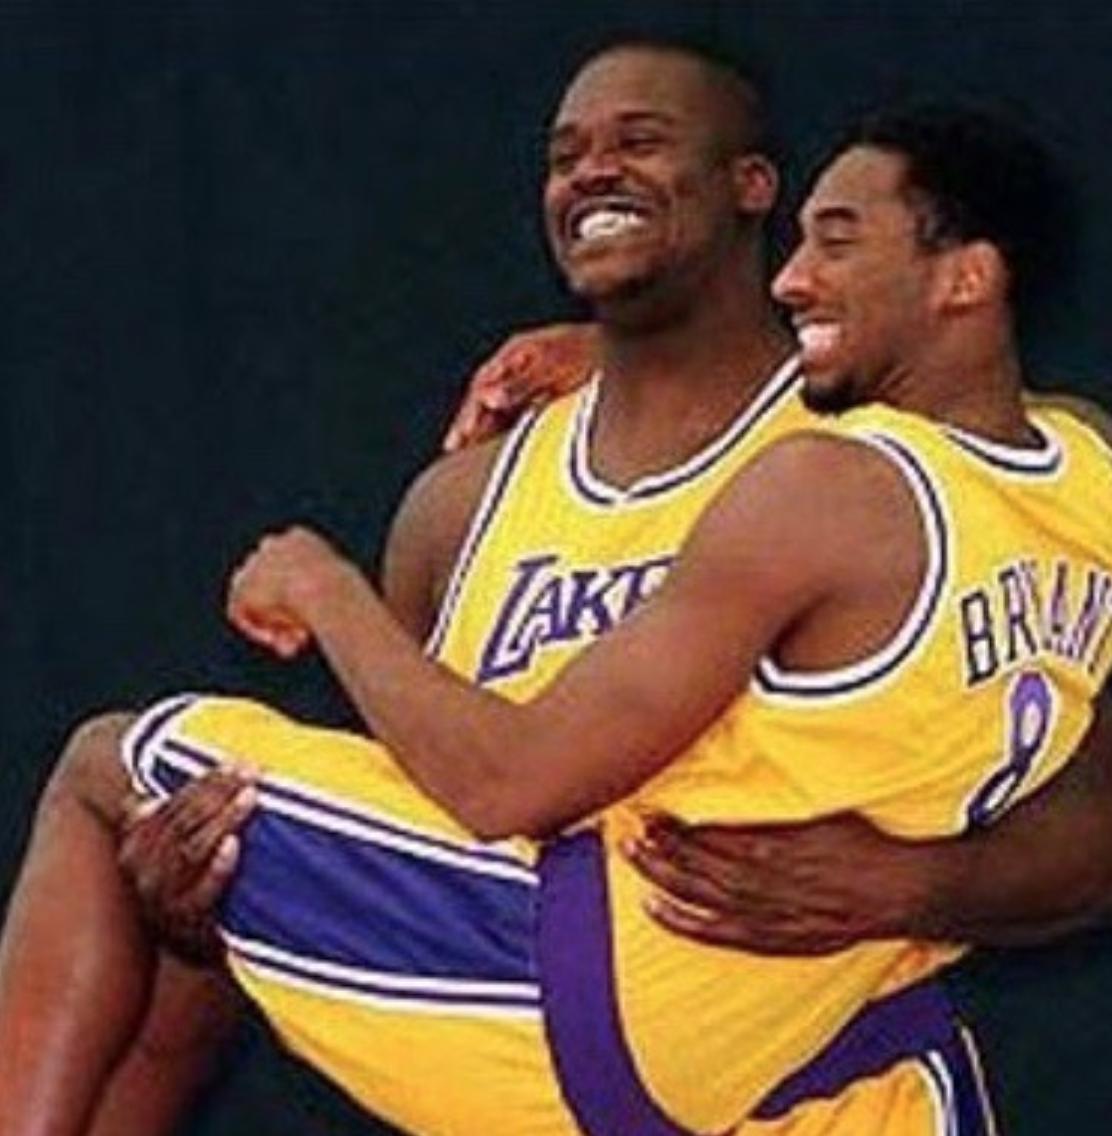 Shaq y Kobe Bryant